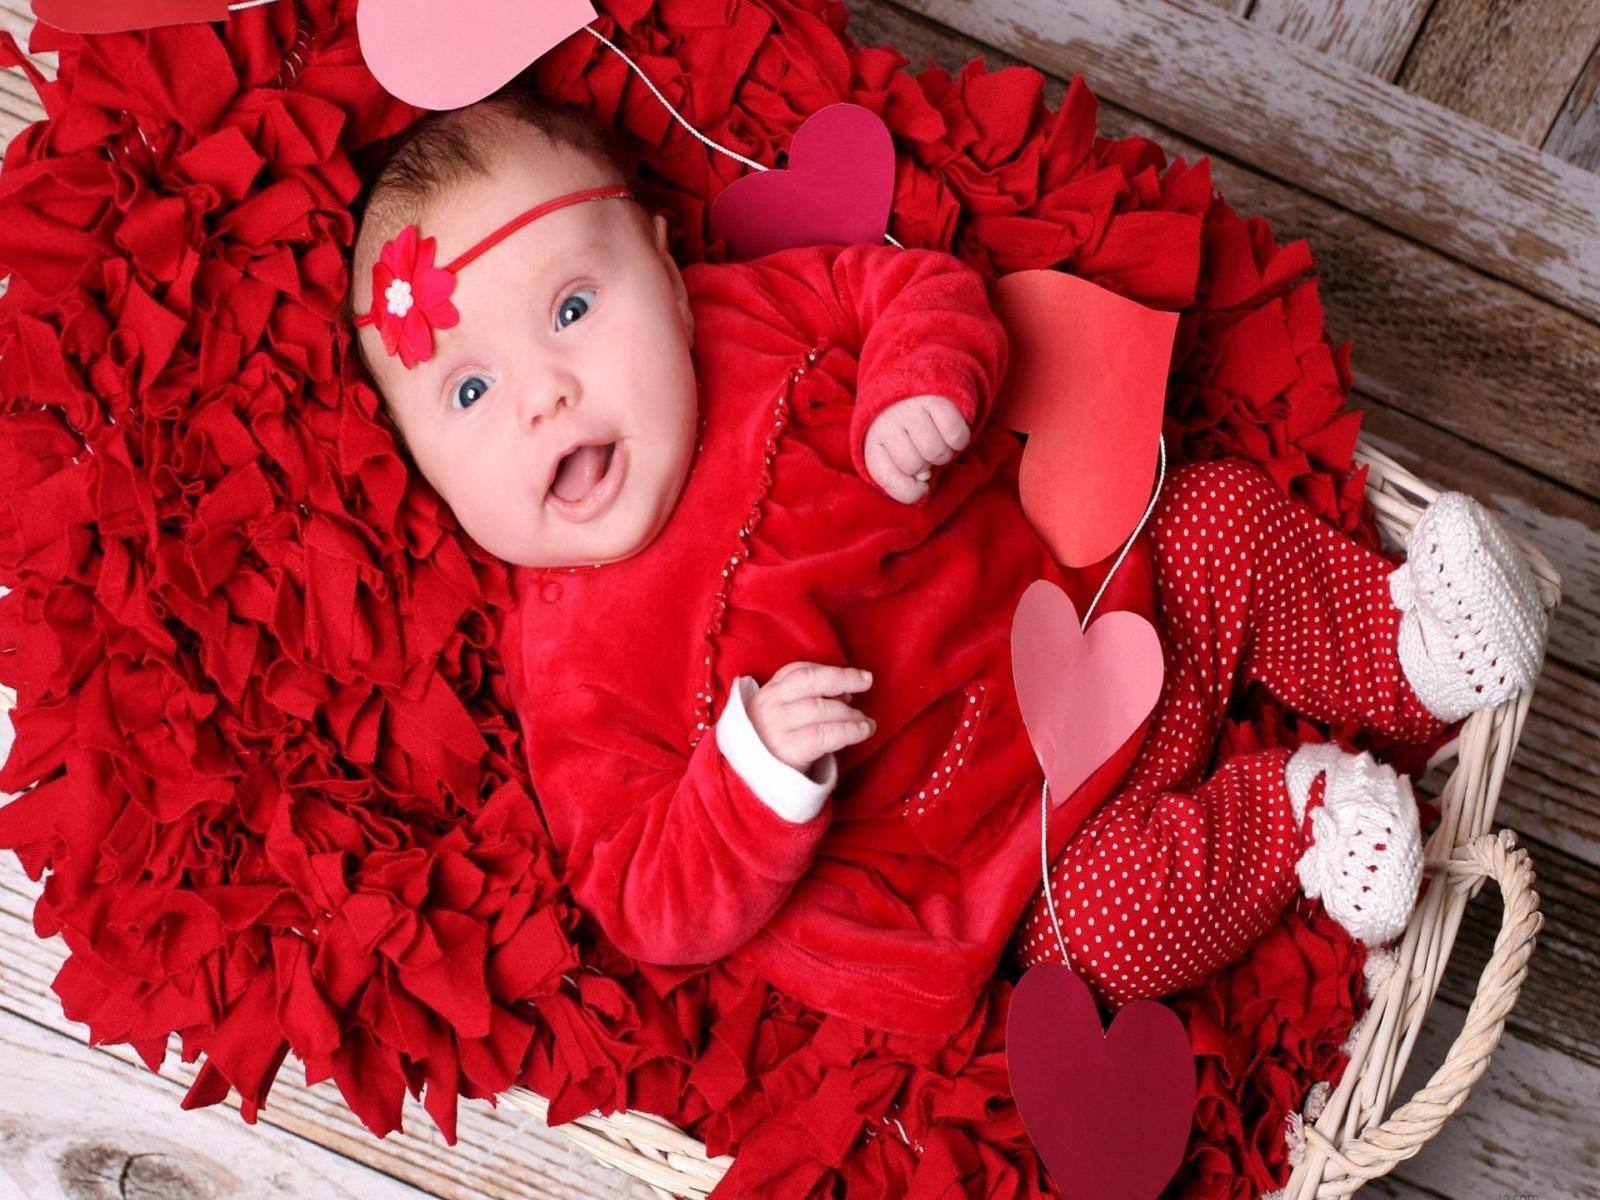 Red Wallpaper Cute Baby Girl Baby Wallpaper Cute Babies